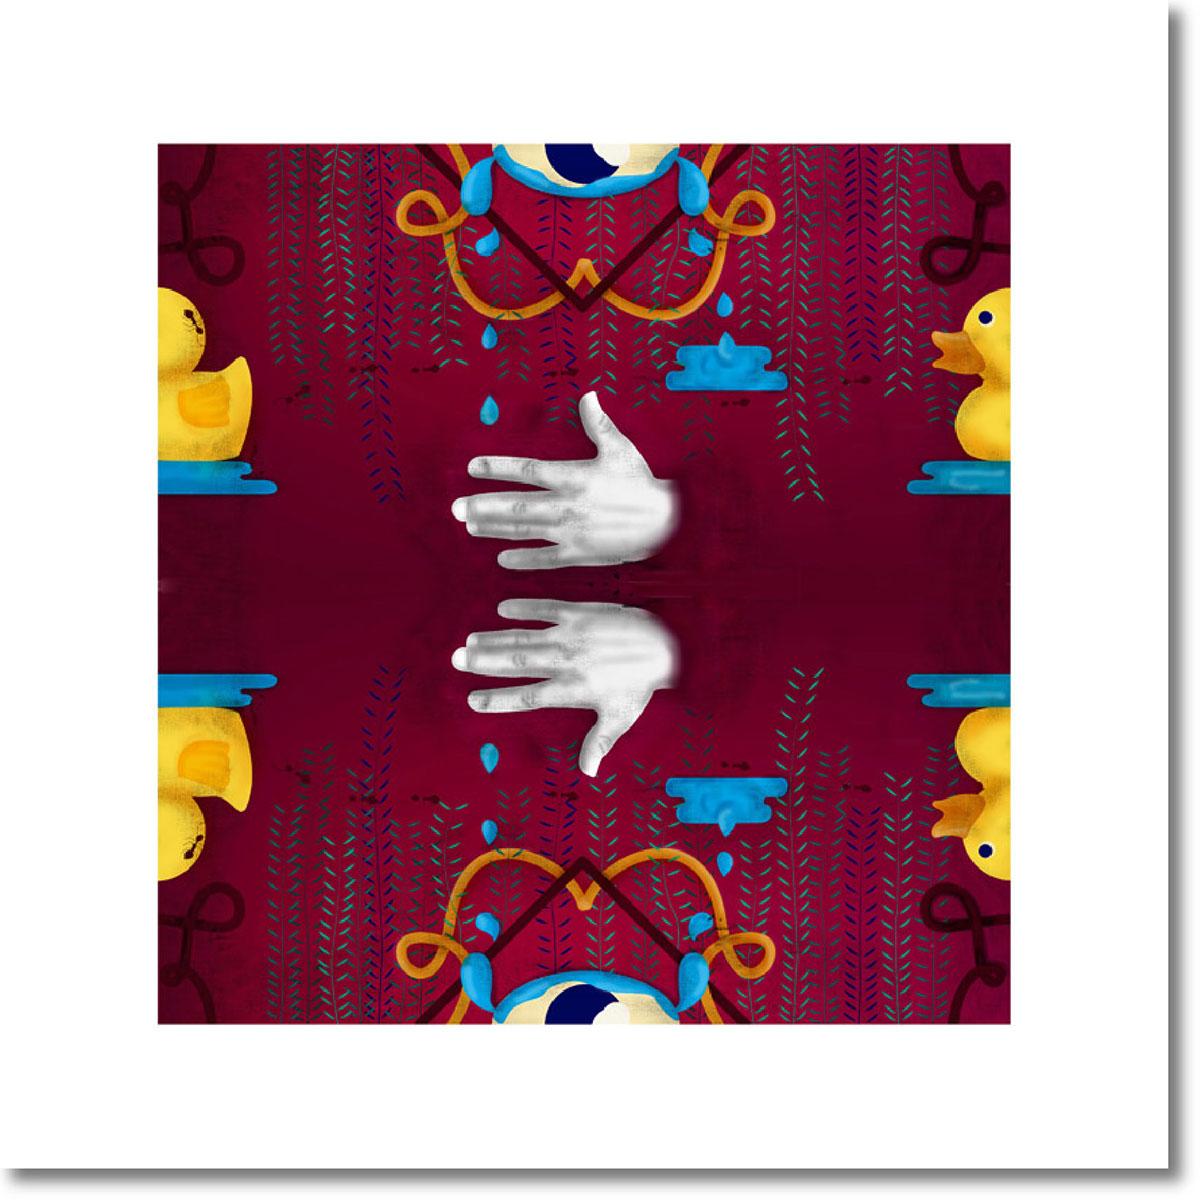 book book illustration Julio Cortázar pattern duck hand plants october pattern october